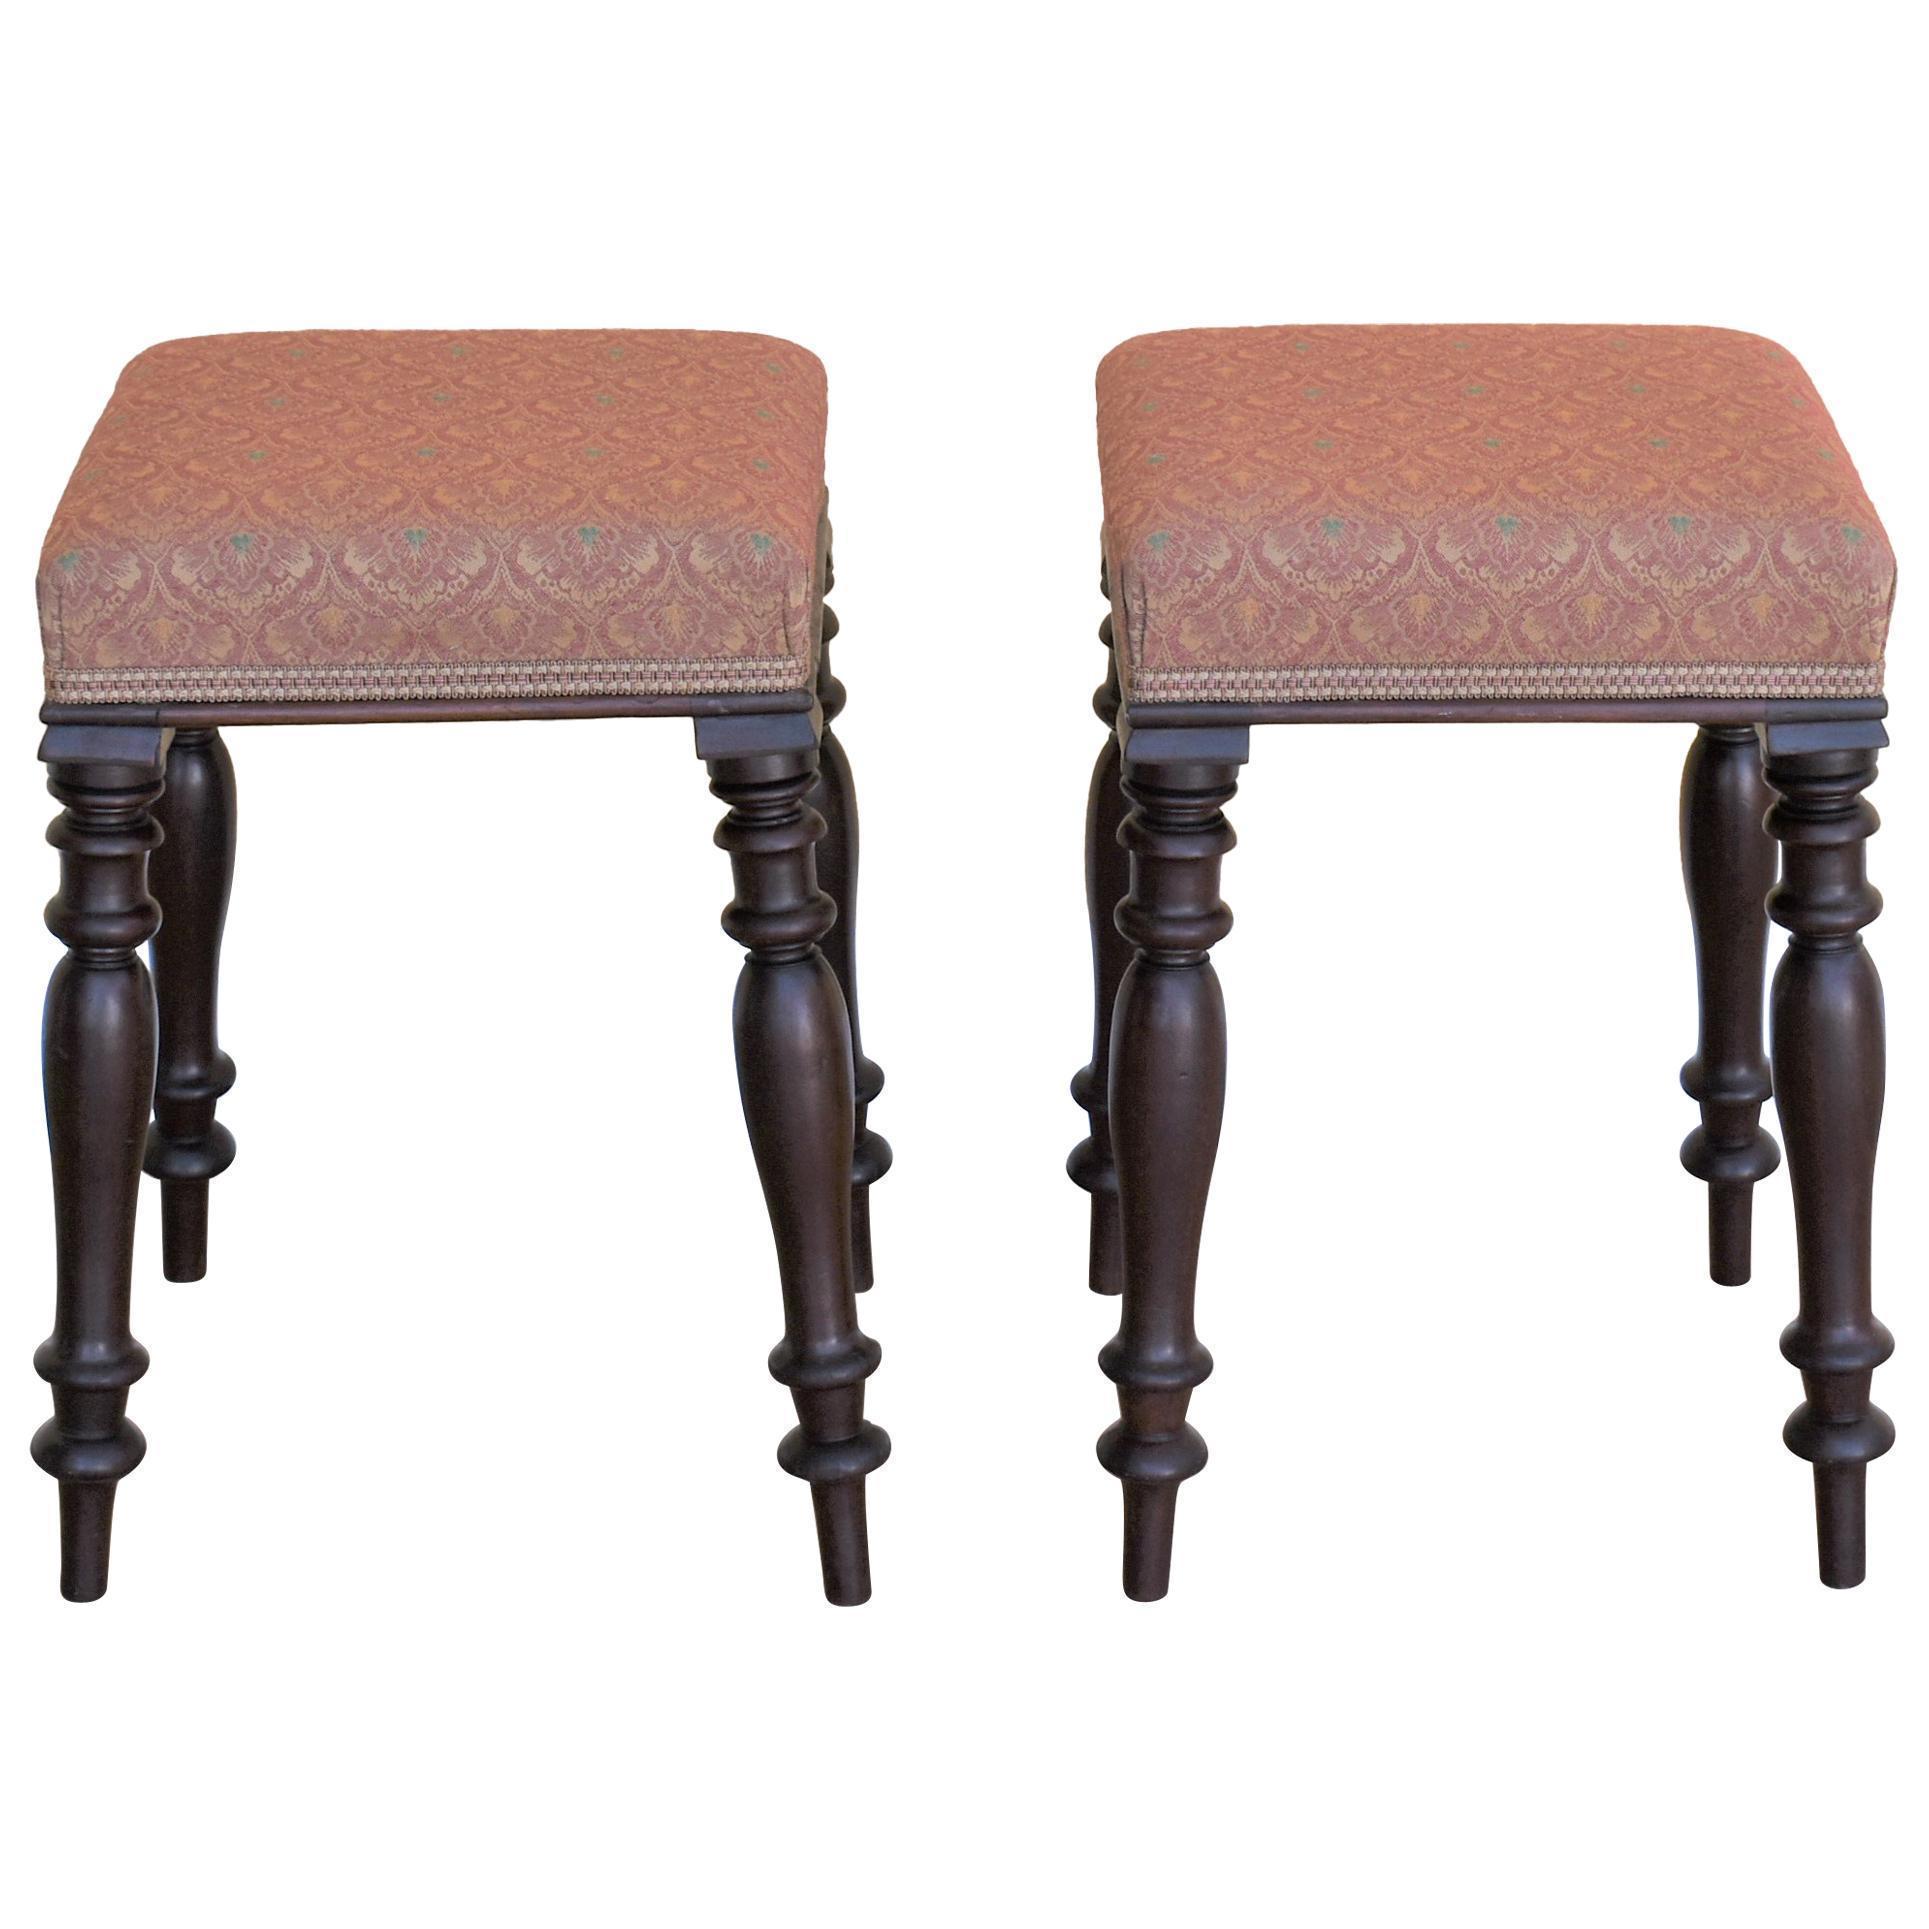 Surprising Pair Of Victorian Mahogany Upholstered Stools Inzonedesignstudio Interior Chair Design Inzonedesignstudiocom